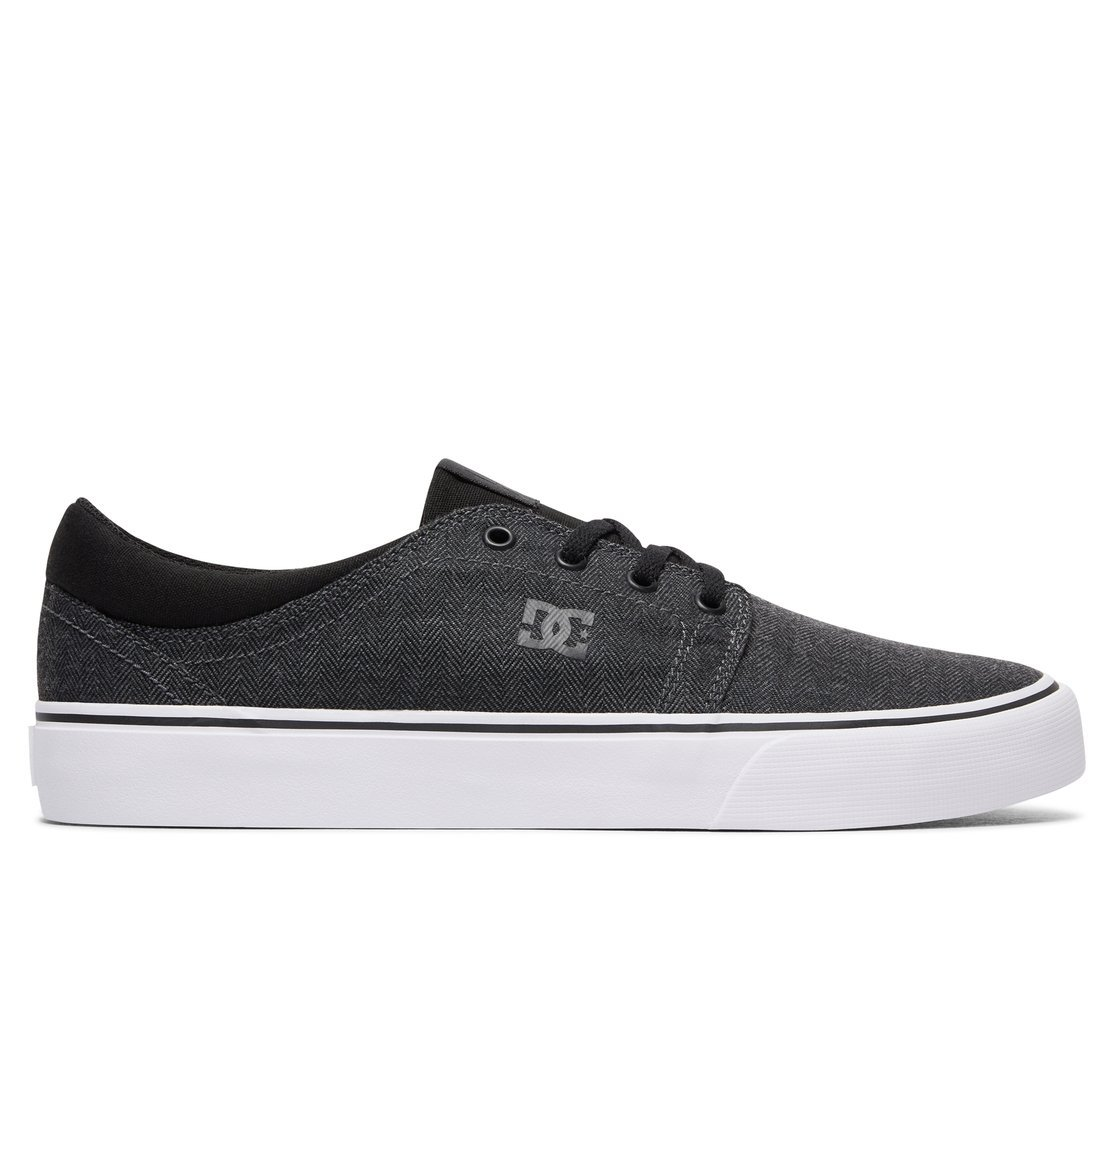 DC Men's Trase TX SE Skate Shoe